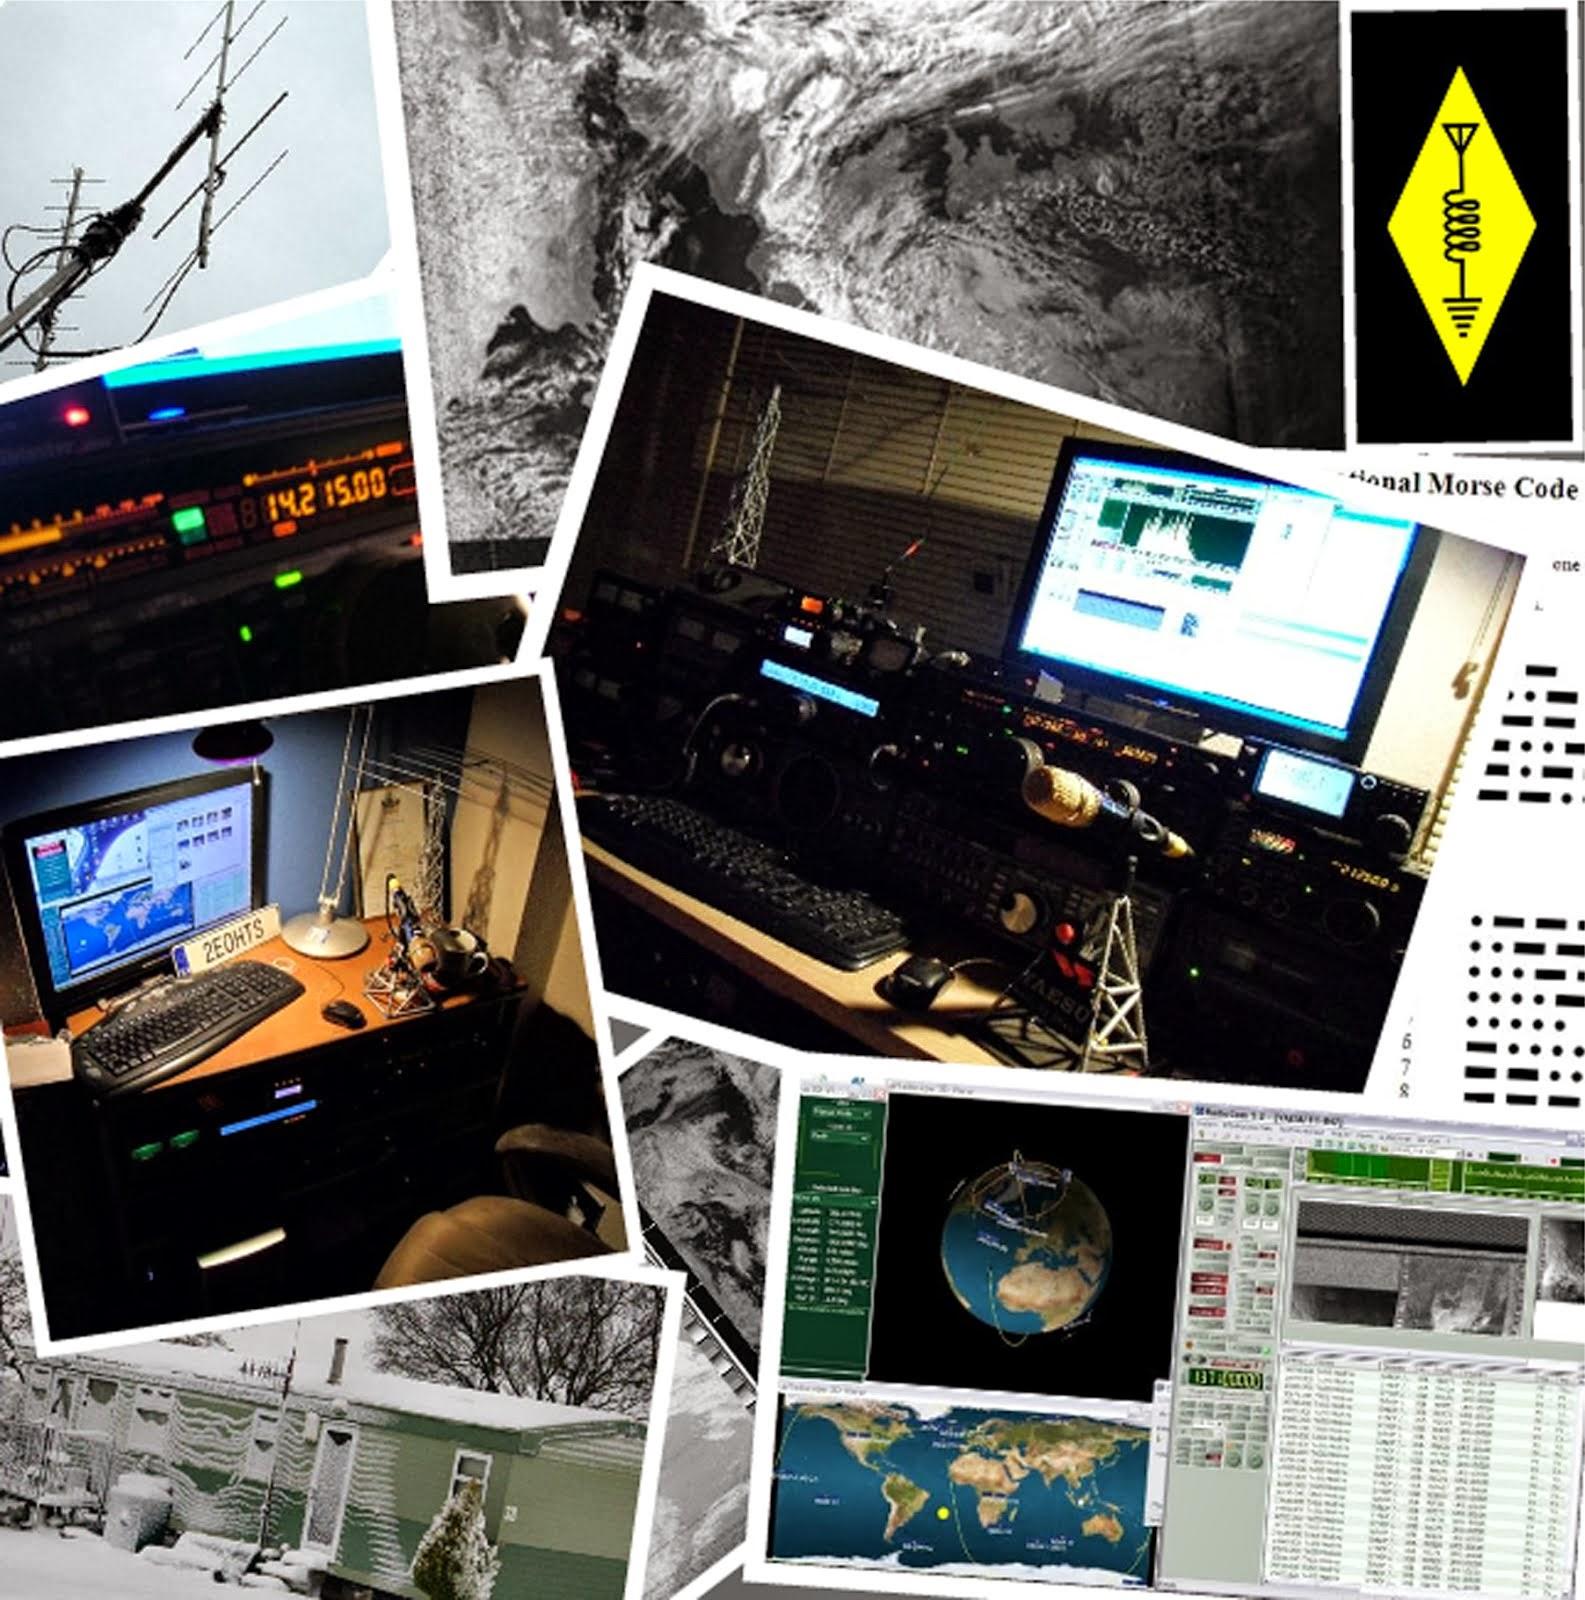 2e0hts Ham Radio Station Loc:IO93CU